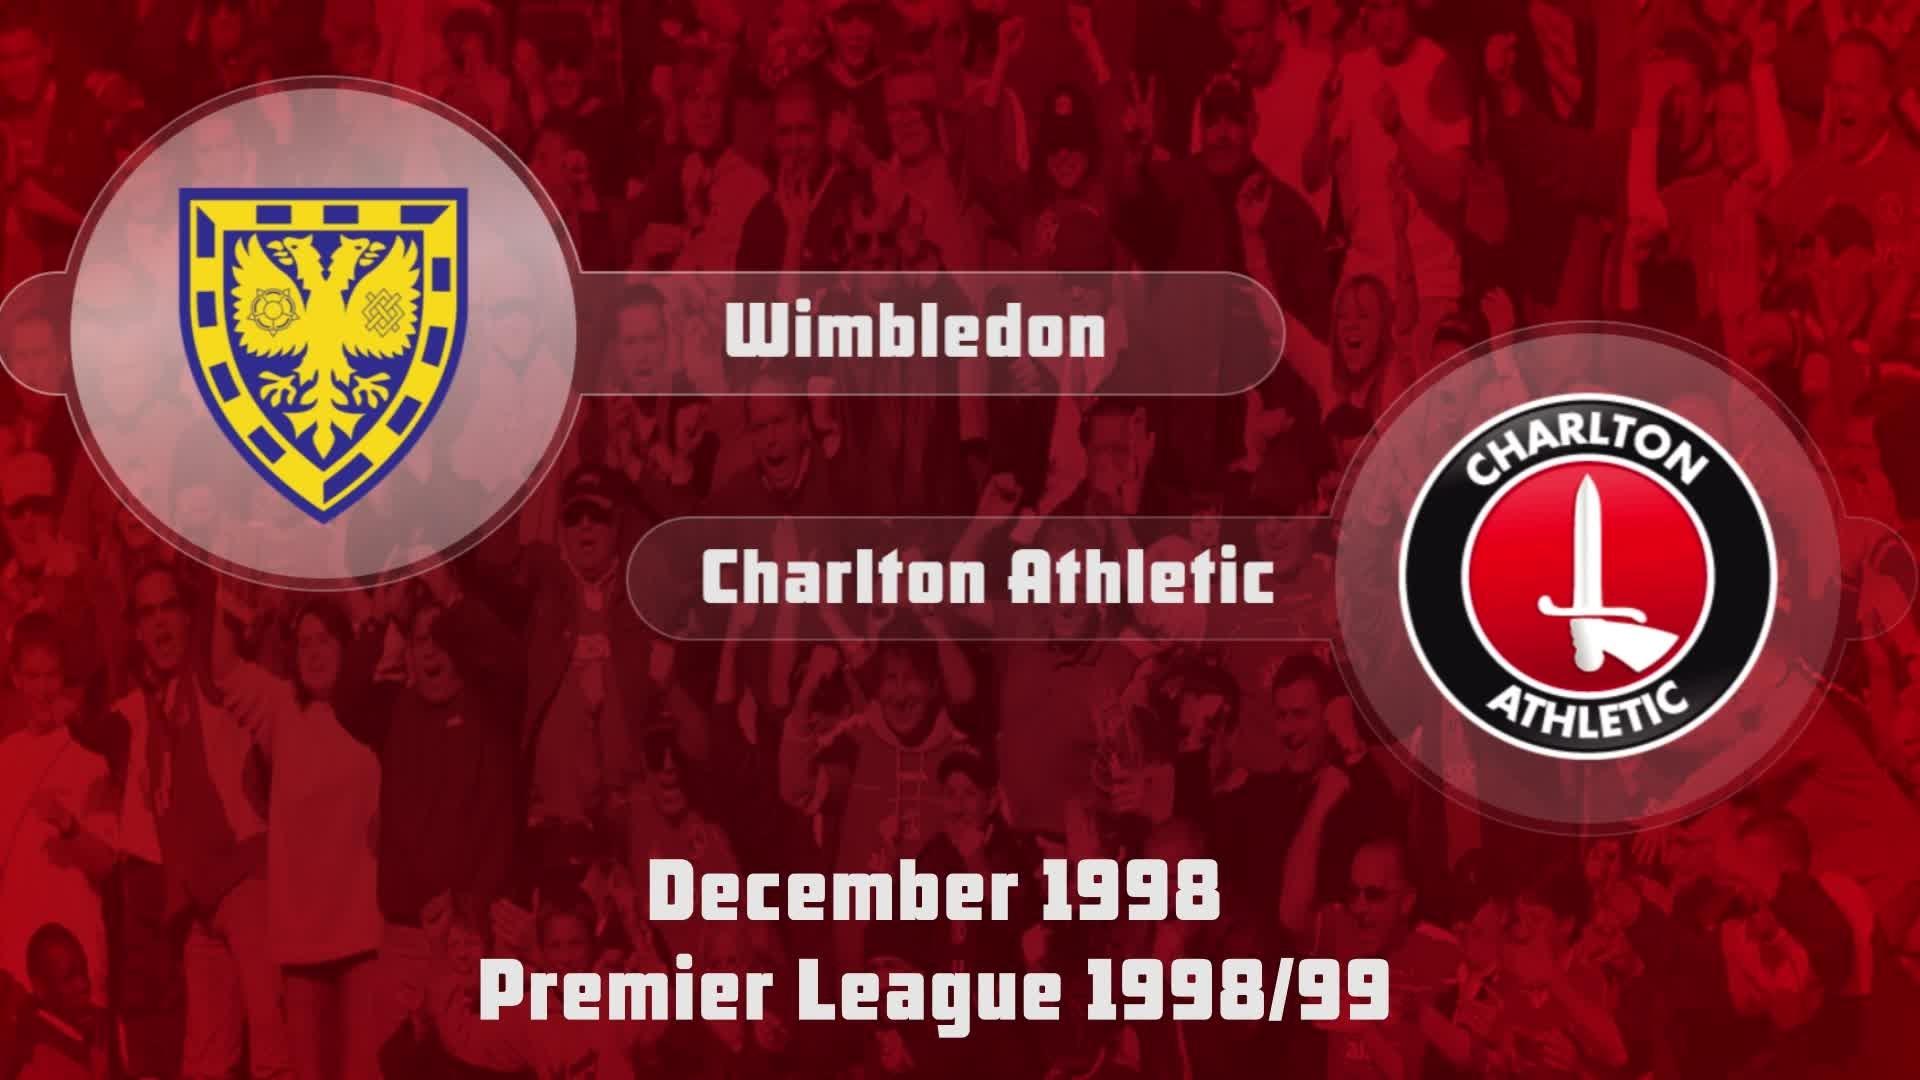 22 HIGHLIGHTS | Wimbledon 2 Charlton 1 (Dec 1998)